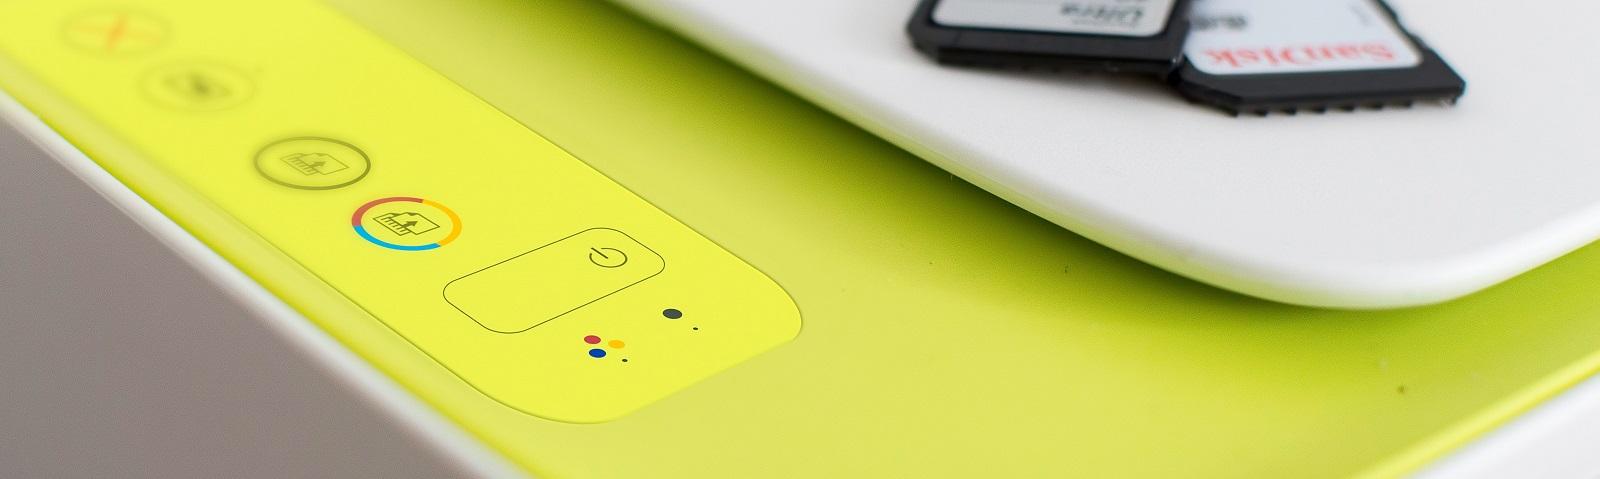 buttons-close-up-depth-of-field-193057-14KPdiP2wLAFwf